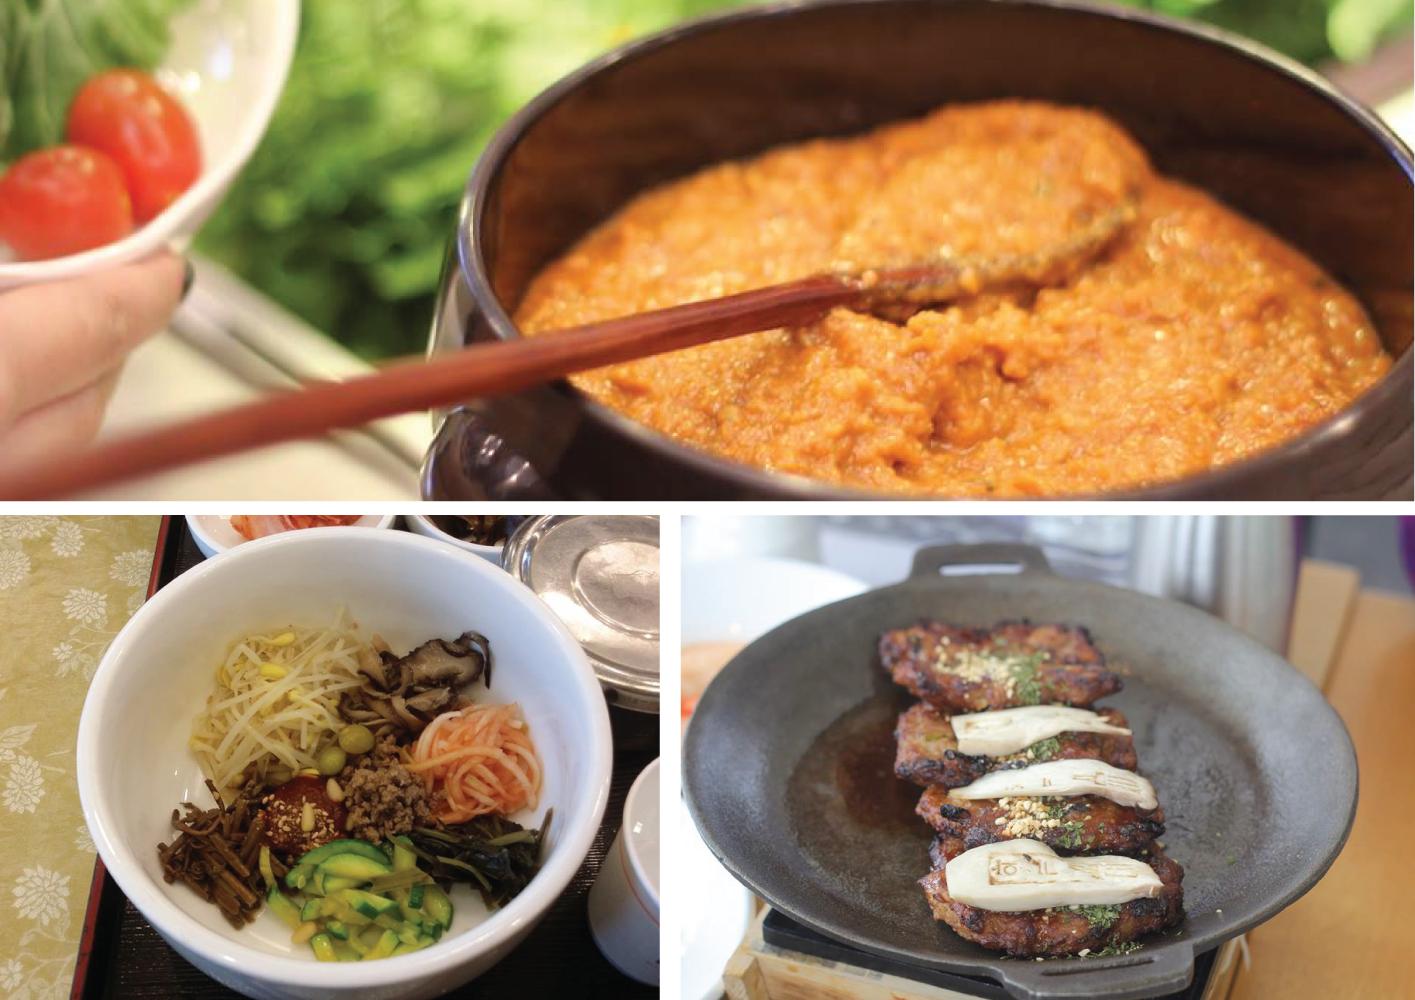 Ẩm thực tại Jeonju